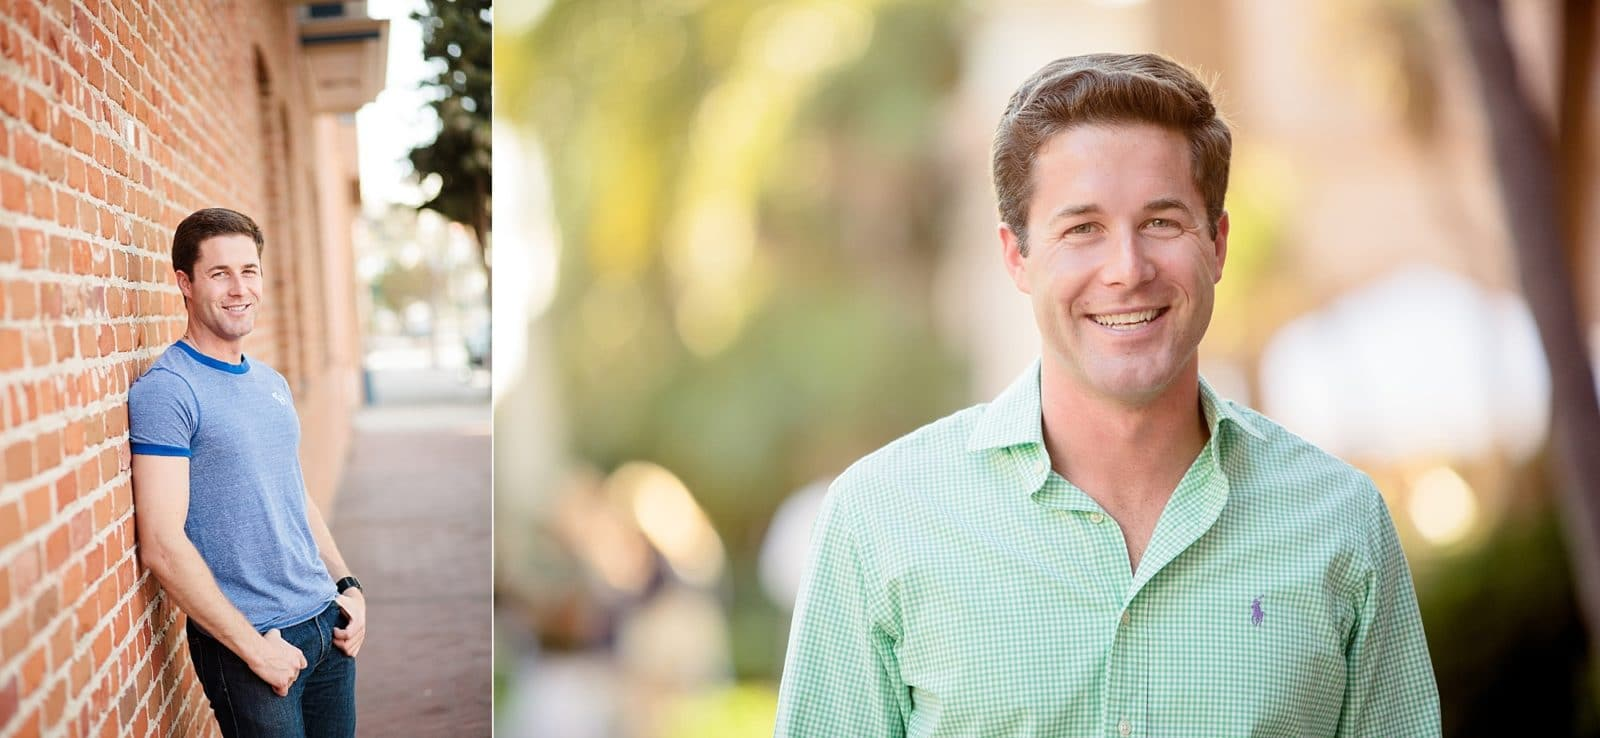 Personal Headshots San Diego | ChristianMingle Photographer